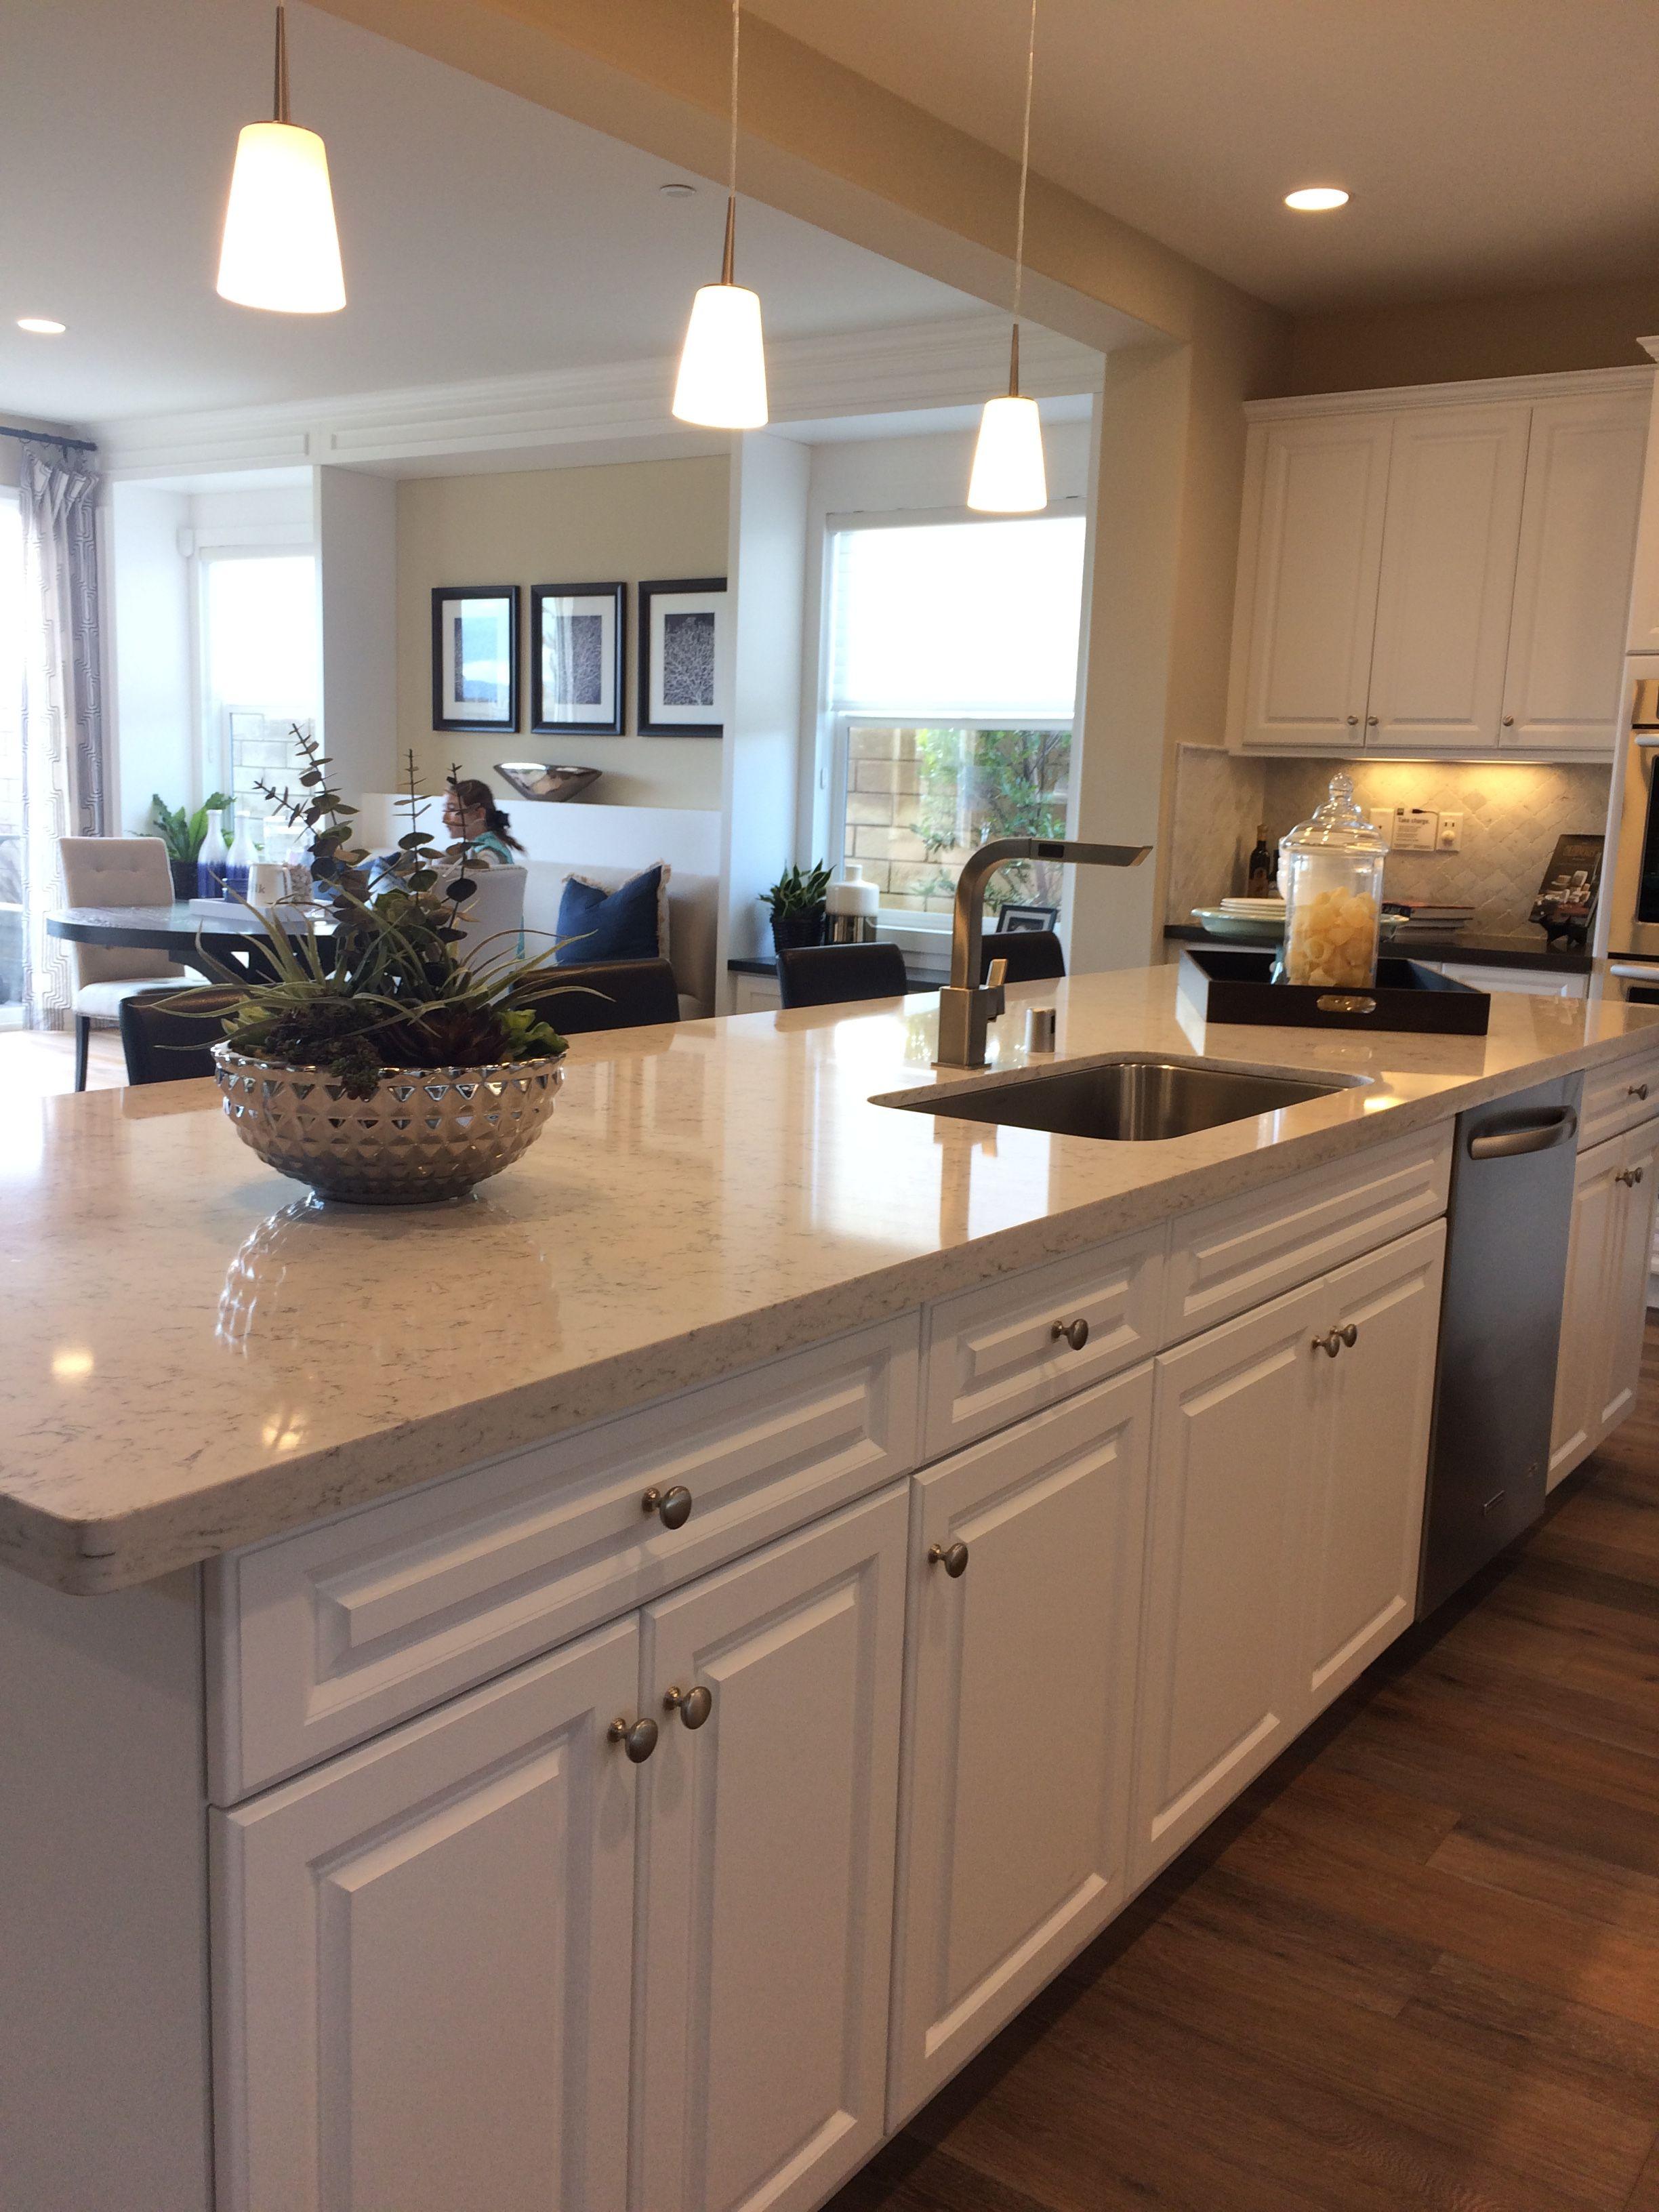 White Kitchen Cabinets, Quartz Countertop, Undermount